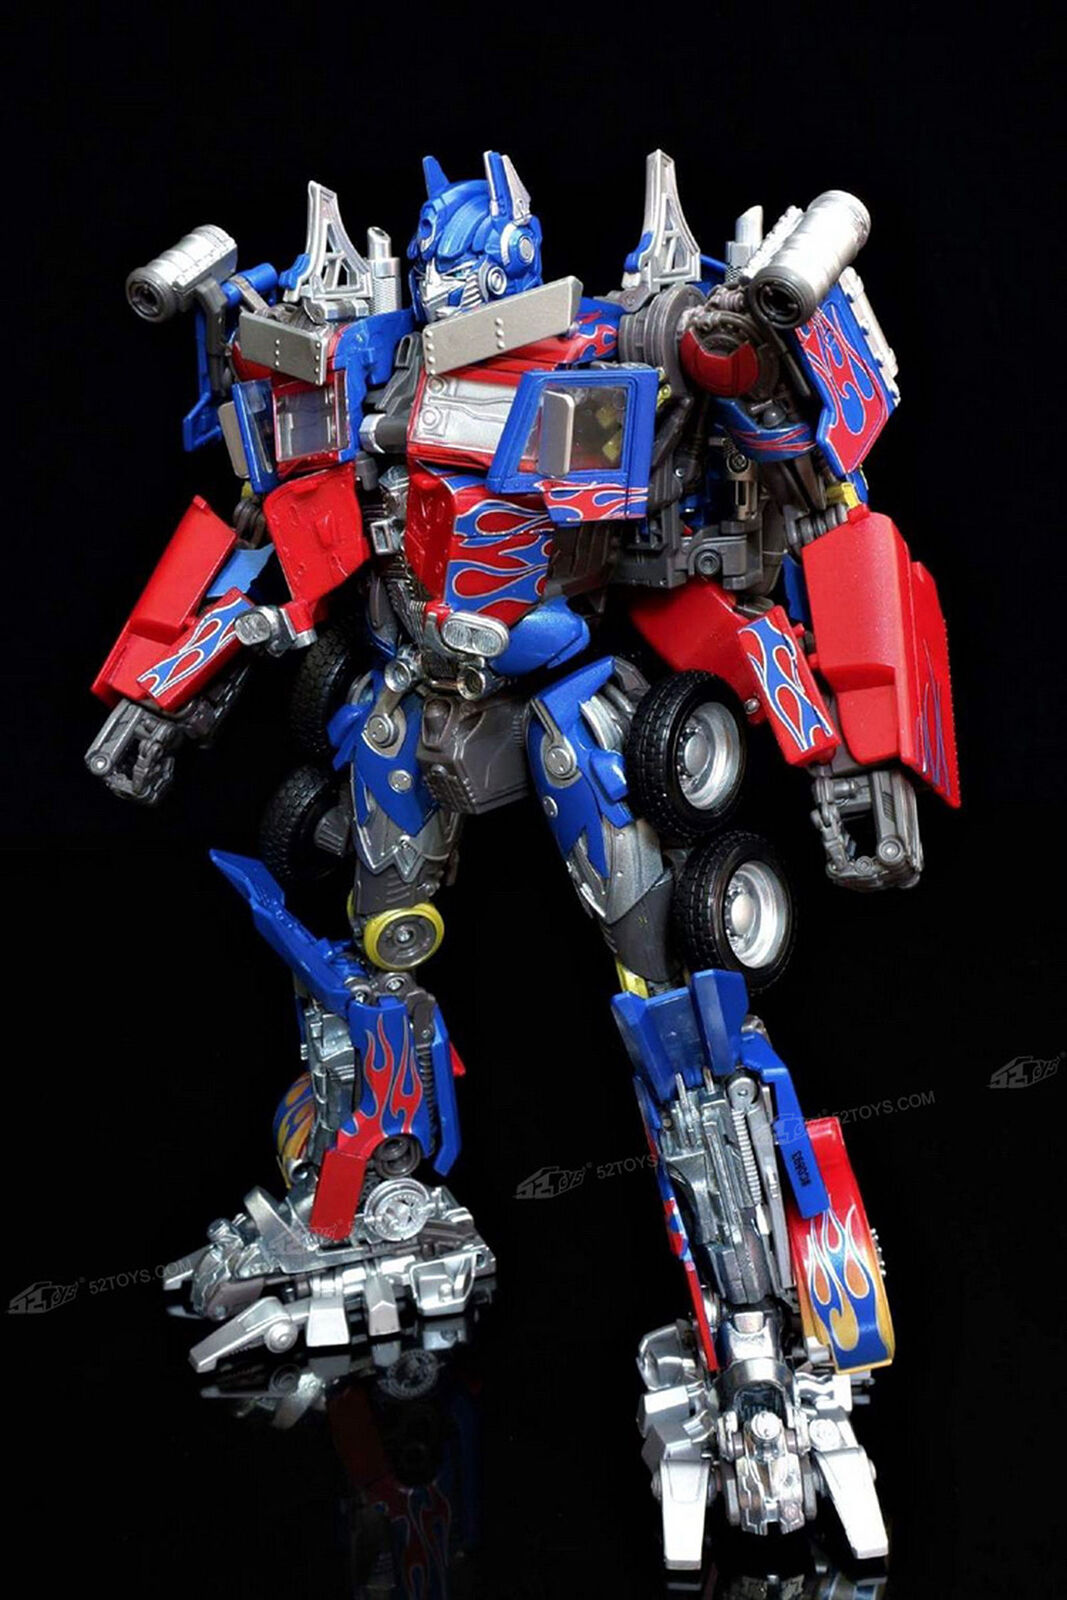 Transformers obra maestra MPM 04 Optimus Prime MPM04 figura de acción juguete de película